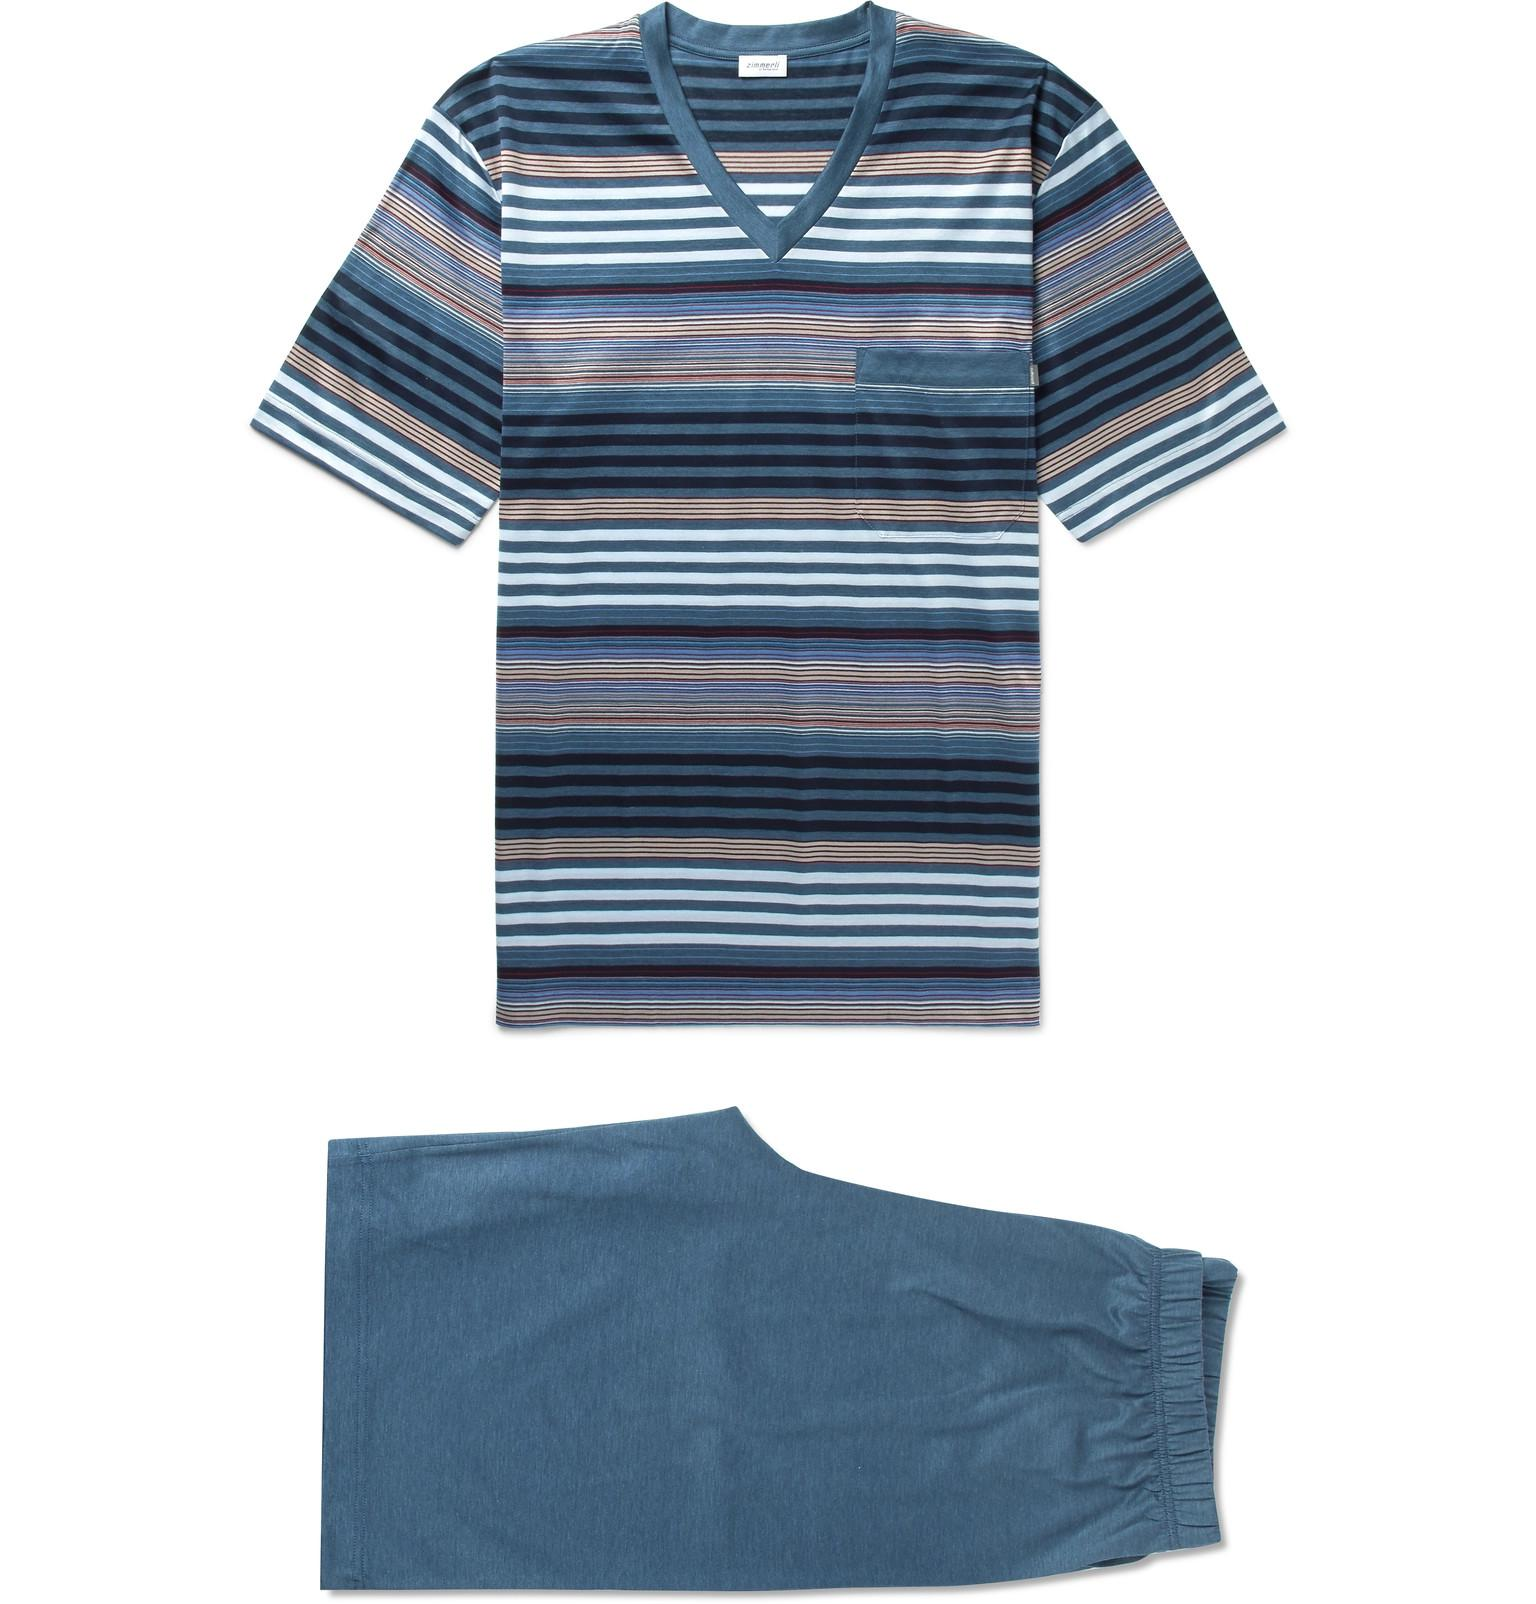 Zimmerli Cotton-jersey Pyjama Set - Blue ohp6tuL